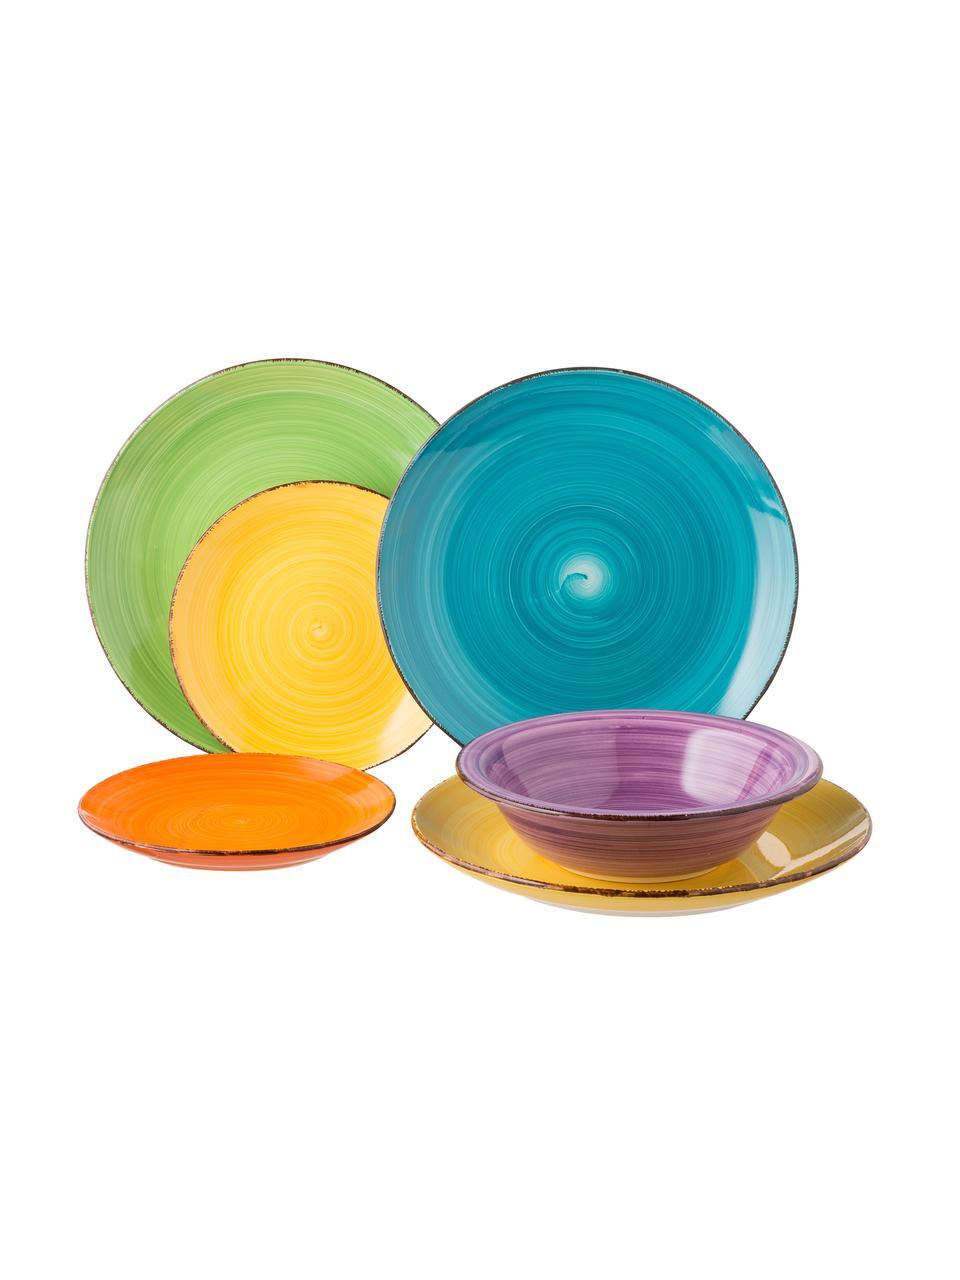 Service de table multicolore Baita, 6personnes (18élém.), Multicolore